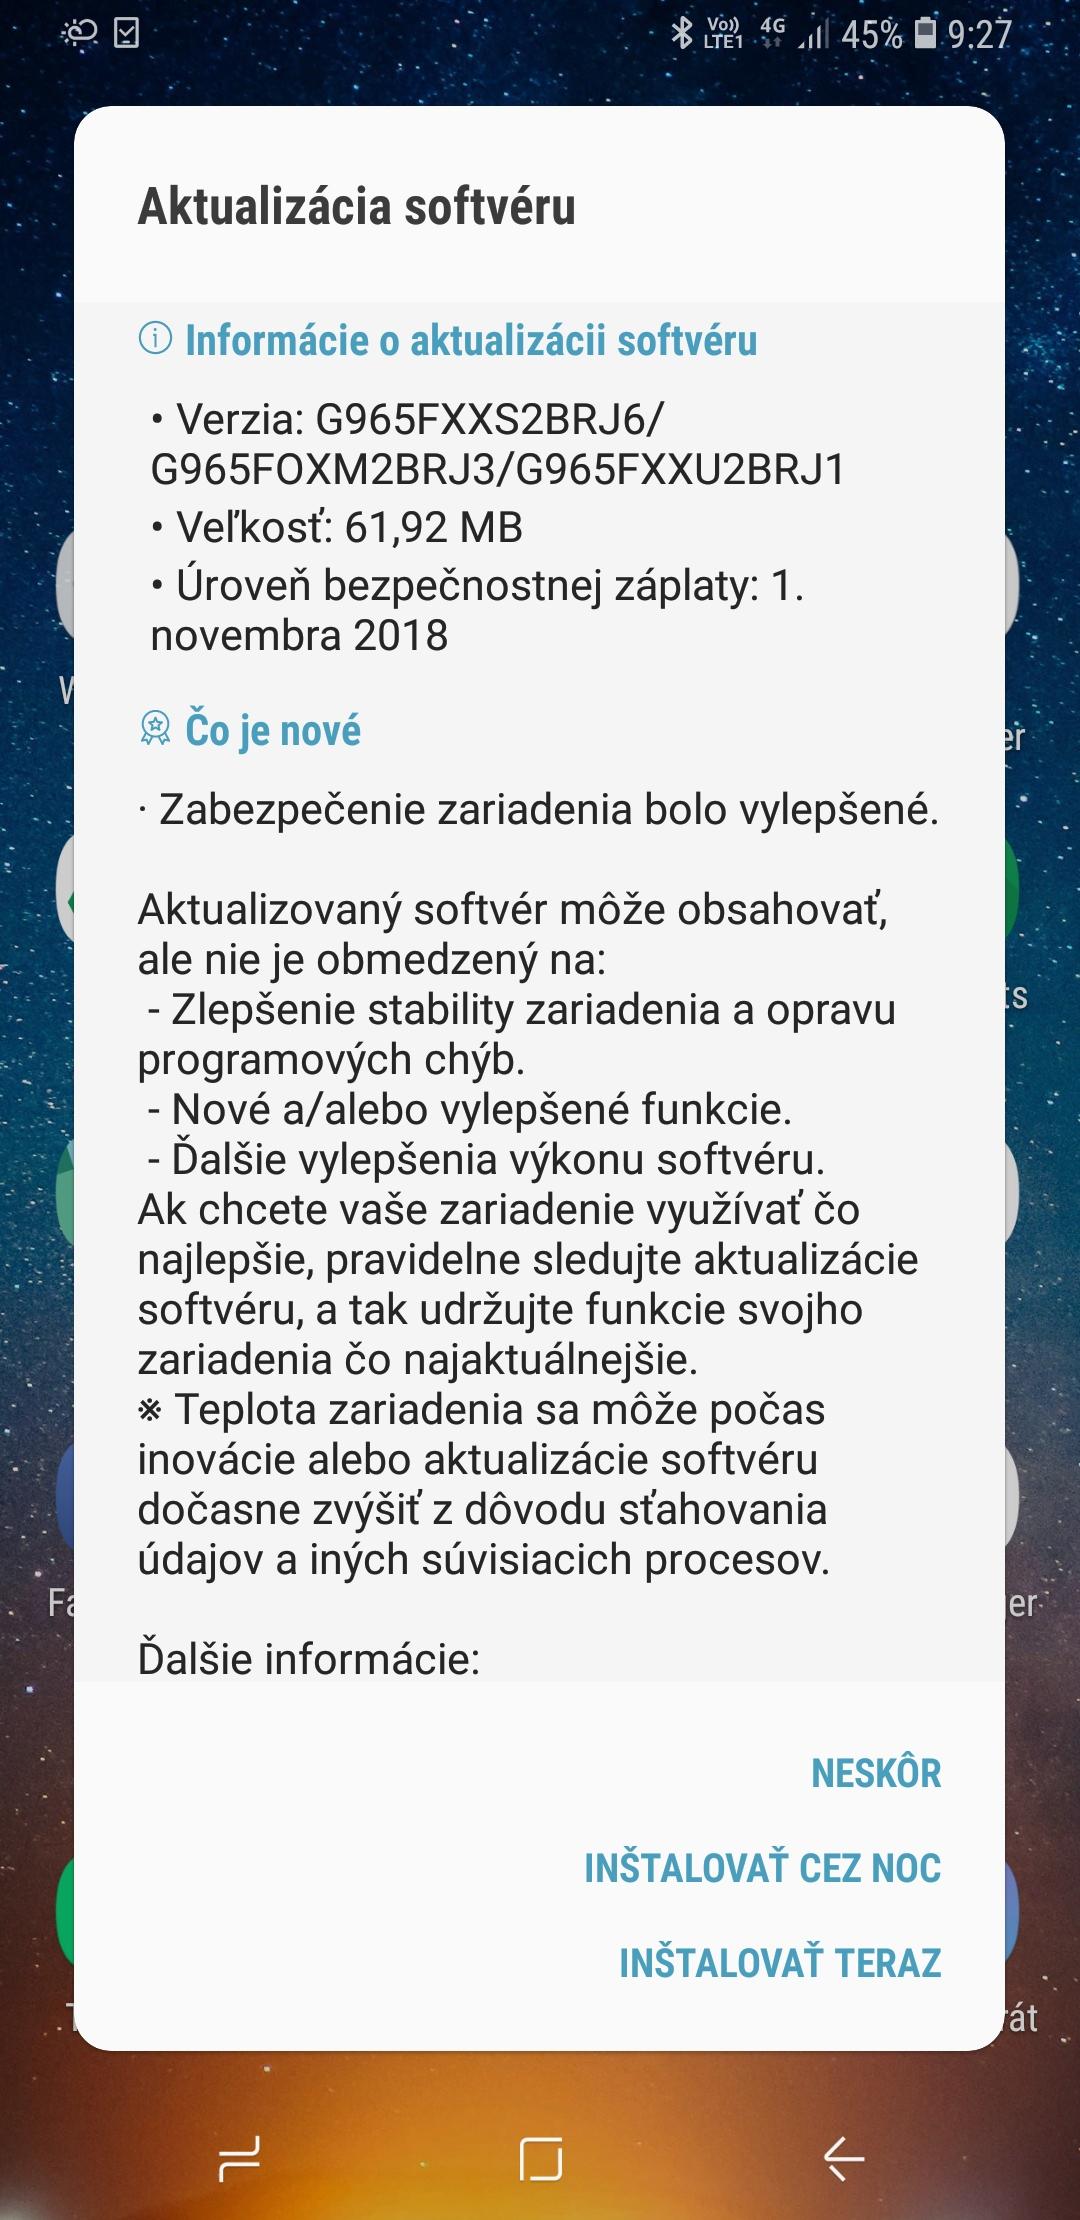 "Samsung Update ""width ="" 400 ""height ="" 822 ""srcset ="" https://www.techbyte.sk/wp-content/uploads/2018/11/Screenshot_20181116-092702_Software-update.jpg 1080w, https: // www .techbyte.sk/wp-content / uploads / 2018/11 / Screenshot_20181116-092702_Software-update-768x1579.jpg 768w, https://www.techbyte.sk/wp-content/uploads/2018/11/Screenshot_20181116-092702_Software - update-696x1431.jpg 696w, https://www.techbyte.sk/wp-content/uploads/2018/11/Screenshot_20181116-092702_Software-update-1068x2195.jpg 1068w, https://www.techbyte.sk/wp - content / uploads / 2018/11 / Screenshot_20181116-092702_Software-update-204x420.jpg 204w, https://www.techbyte.sk/wp-content/uploads/2018/11/Screenshot_20181116-092702_Software-update-778x1600.jpg 778w ""sizes ="" (max-width: 400px) 100vw, 400px"